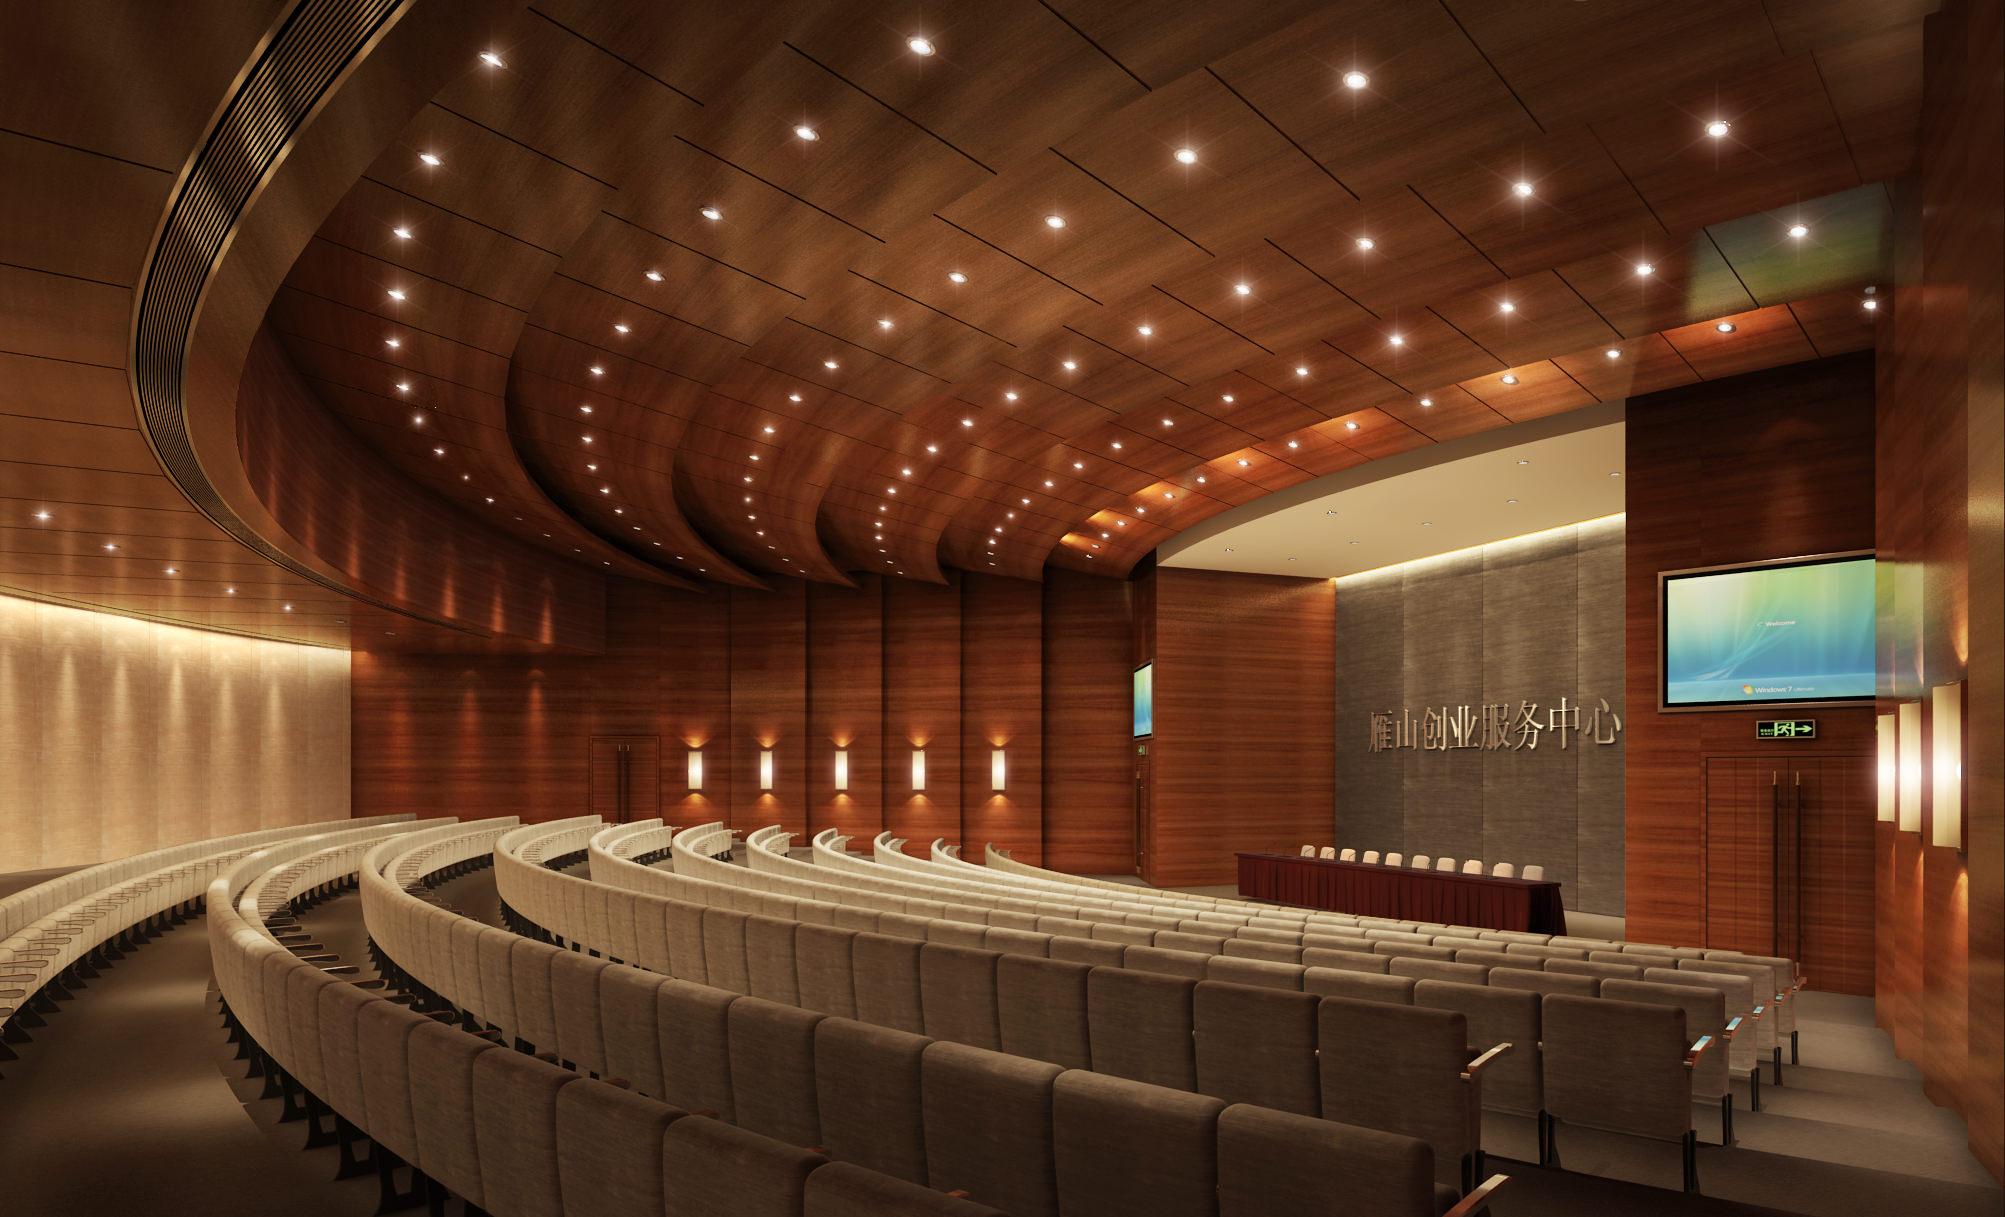 Theater 3d Model Max Cgtrader Com